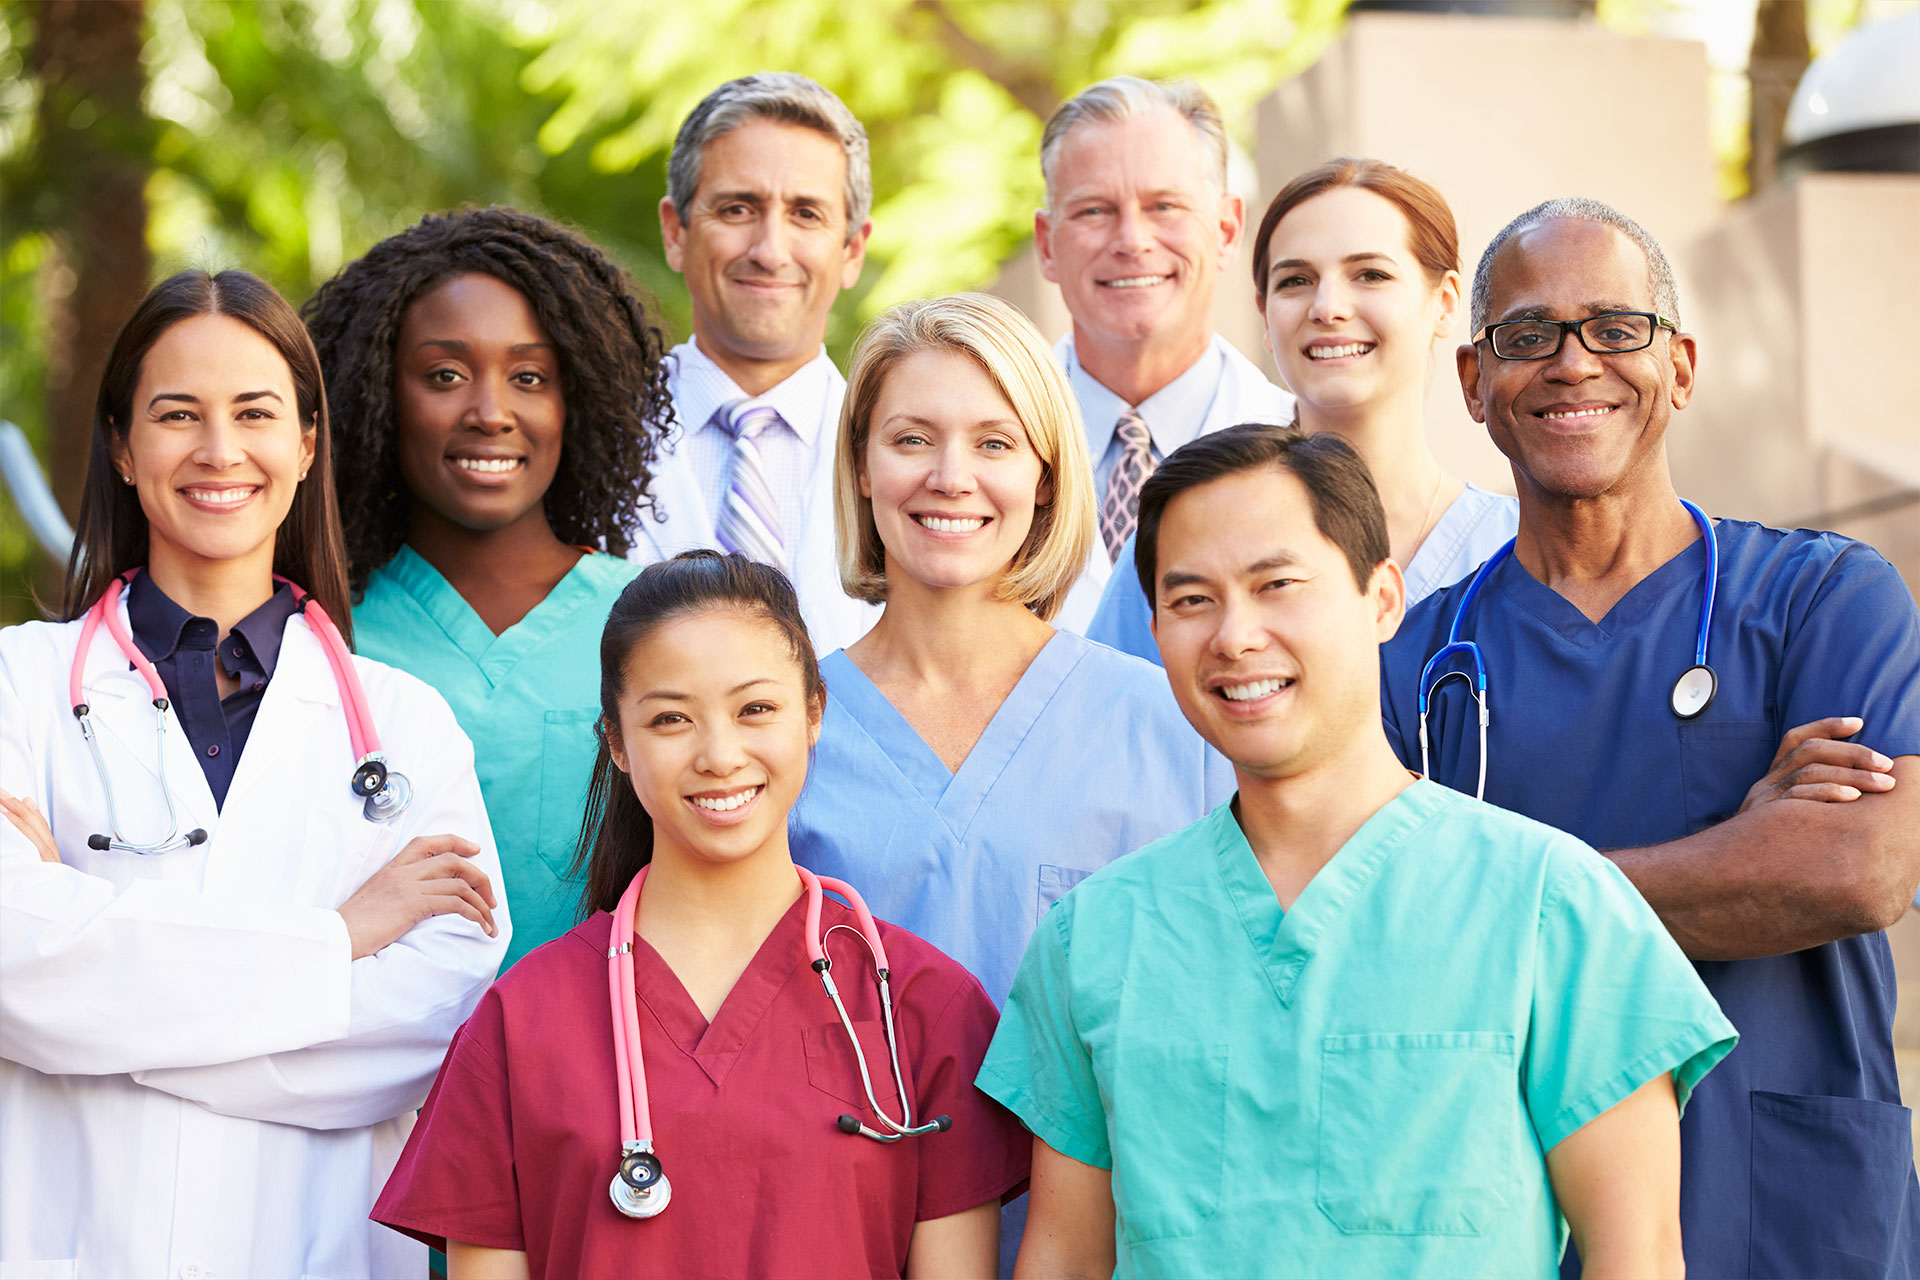 Nurses and Doctors, healthcare